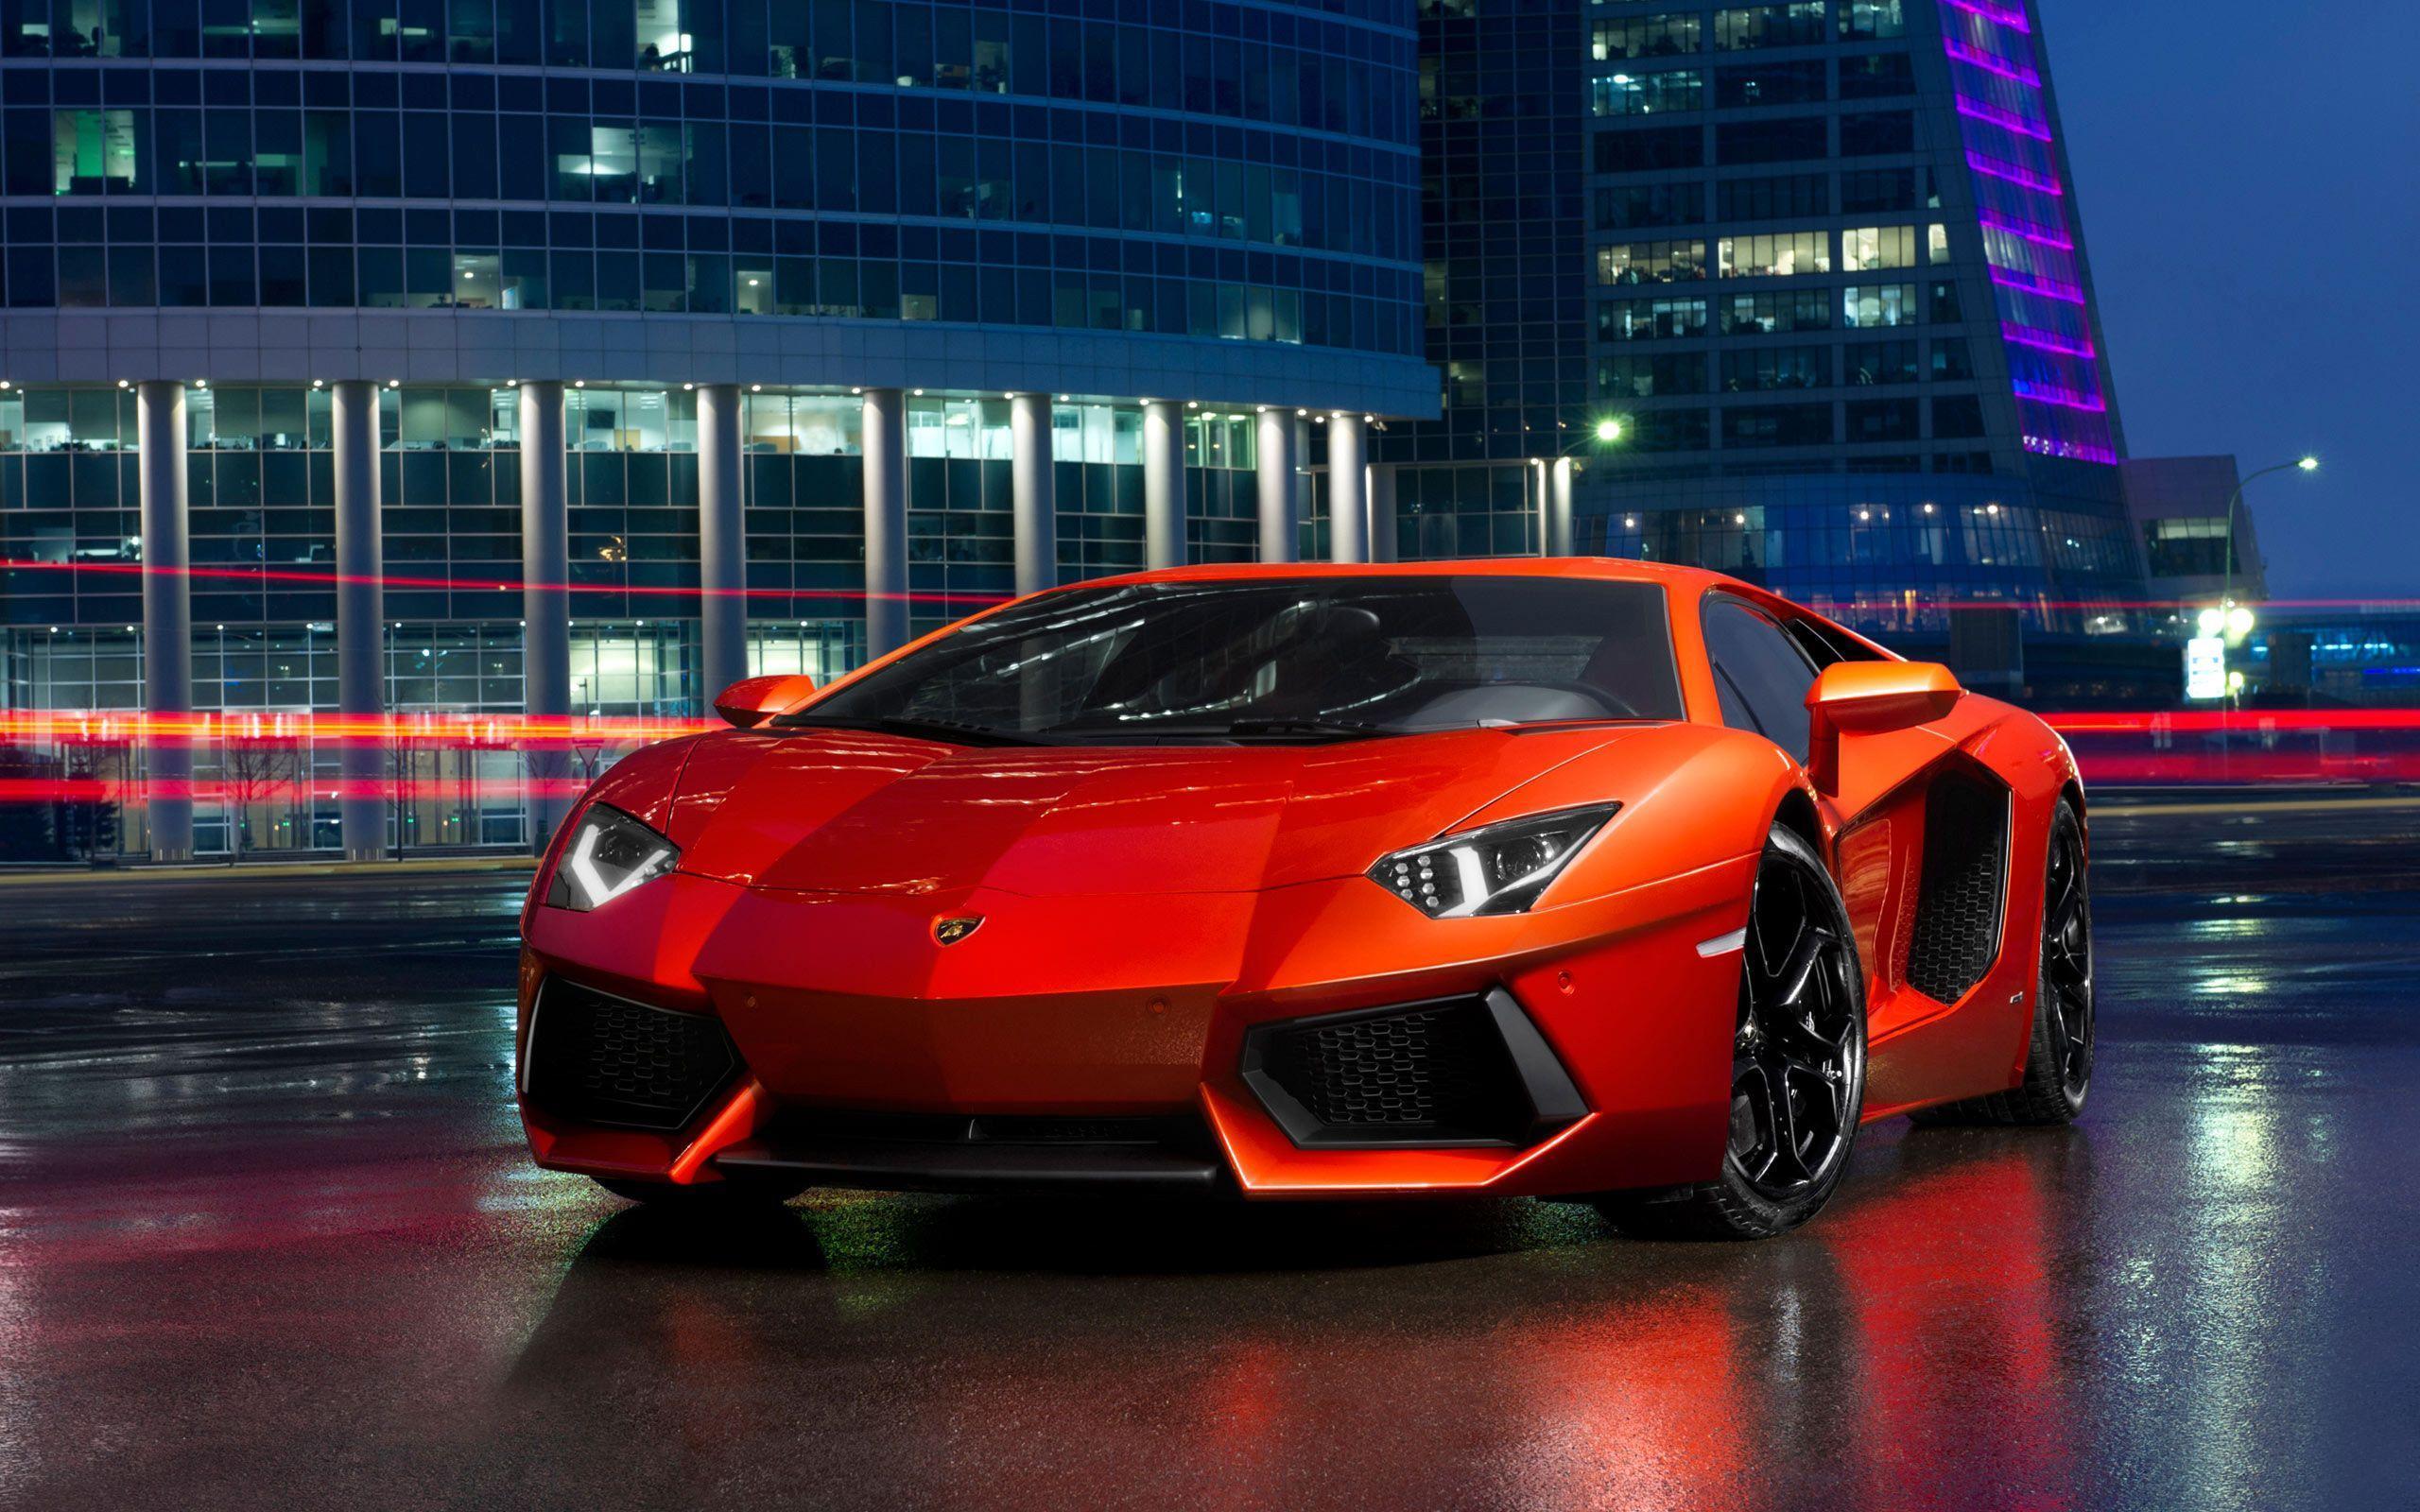 Lamborghini Aventador Hd Wallpapers Wallpaper Cave